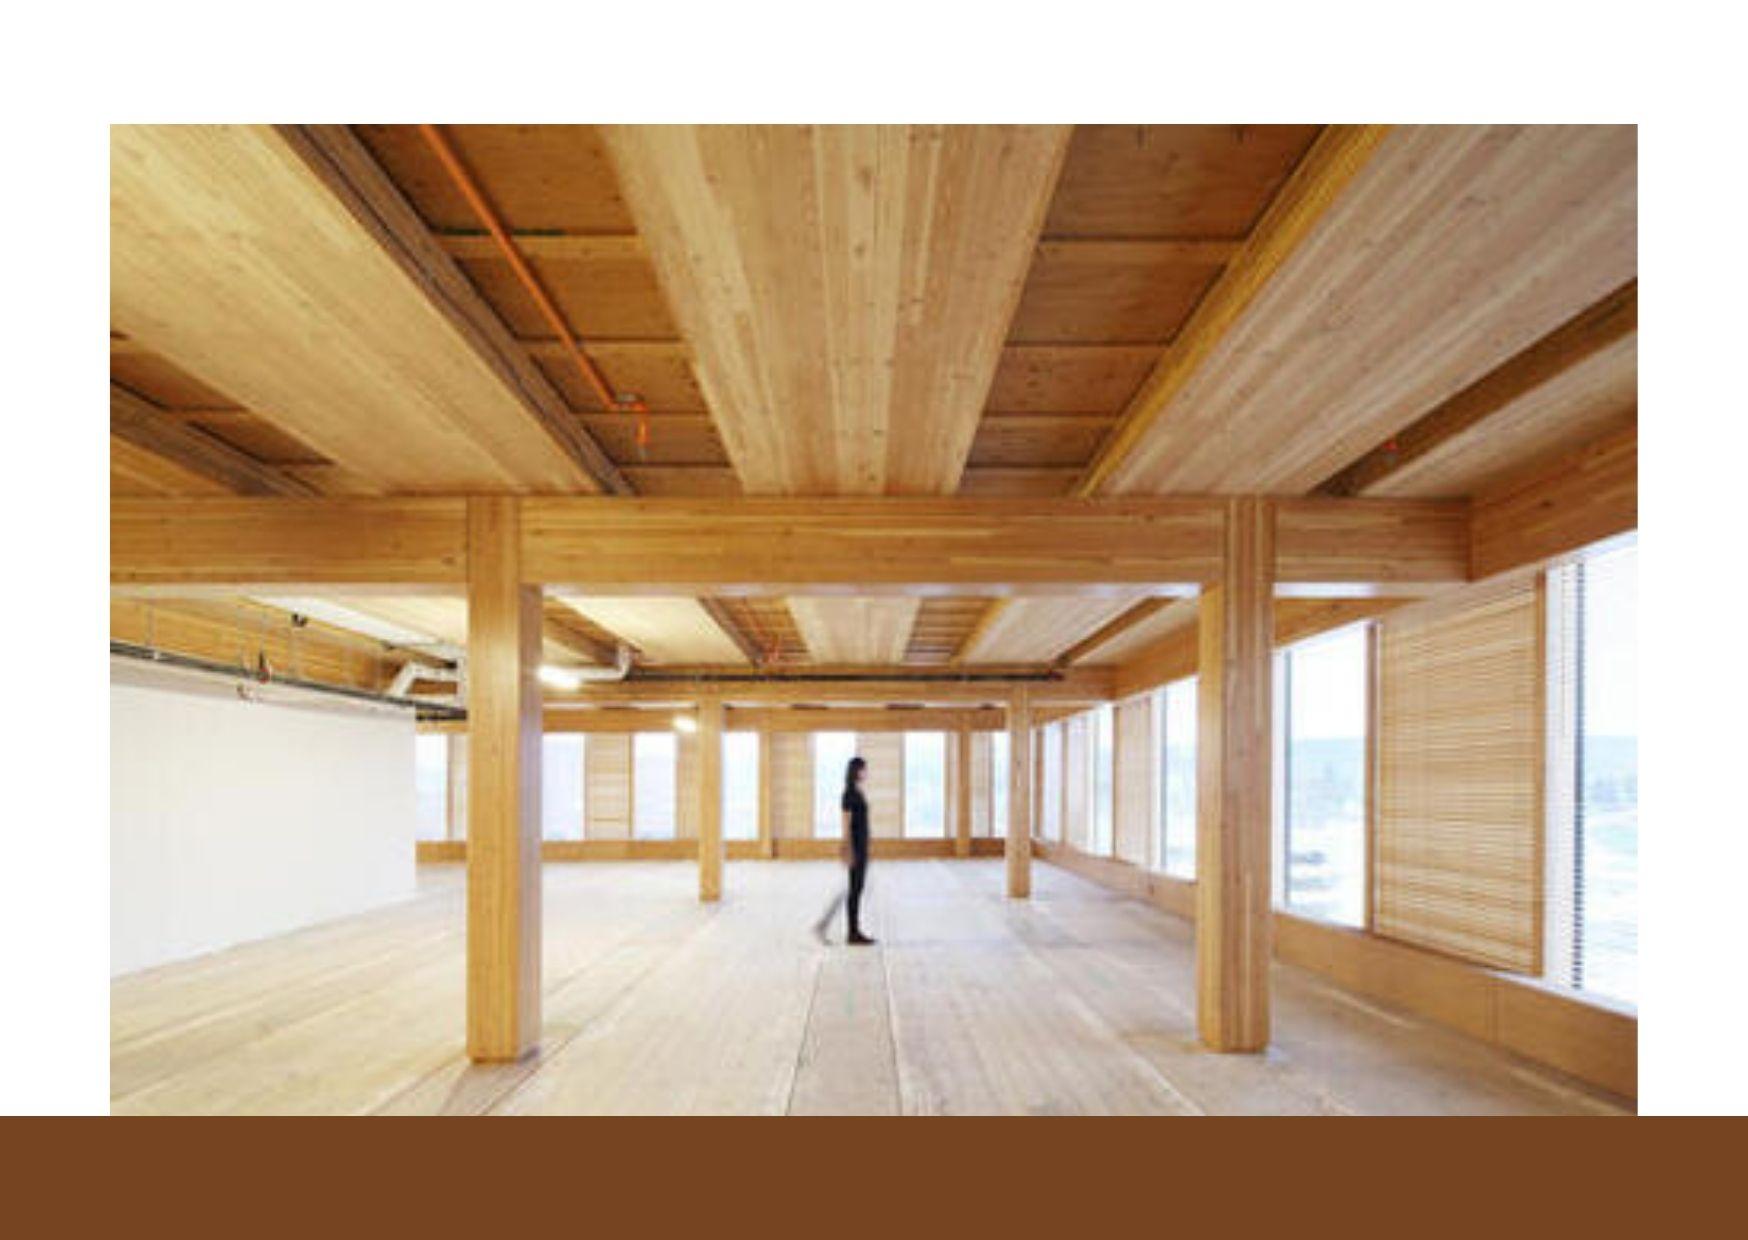 Futuro dos produtos de madeira